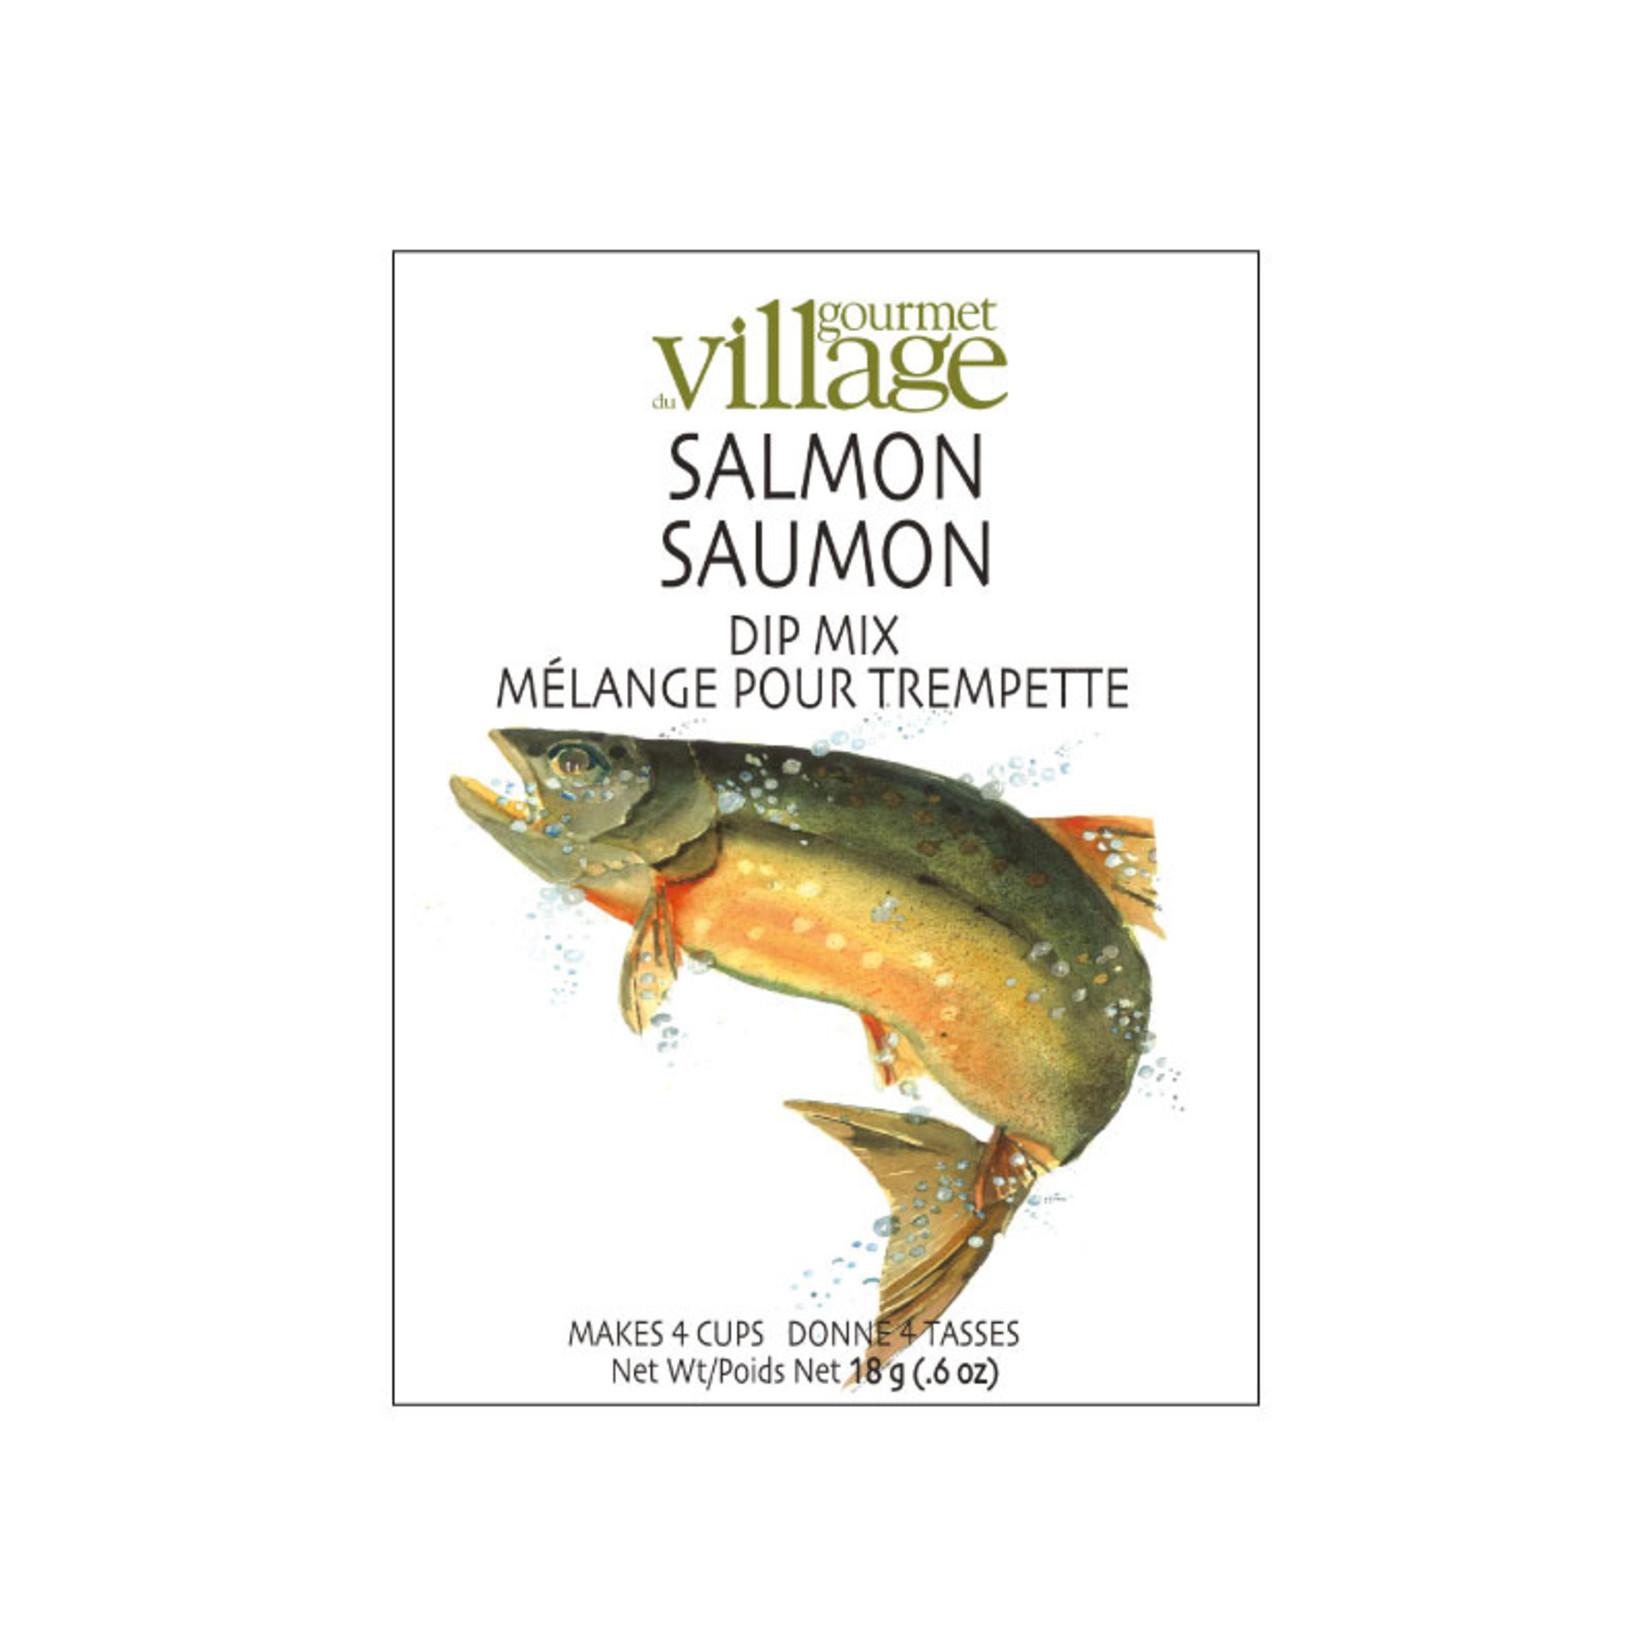 Gourmet Village Salmon Dip Mix